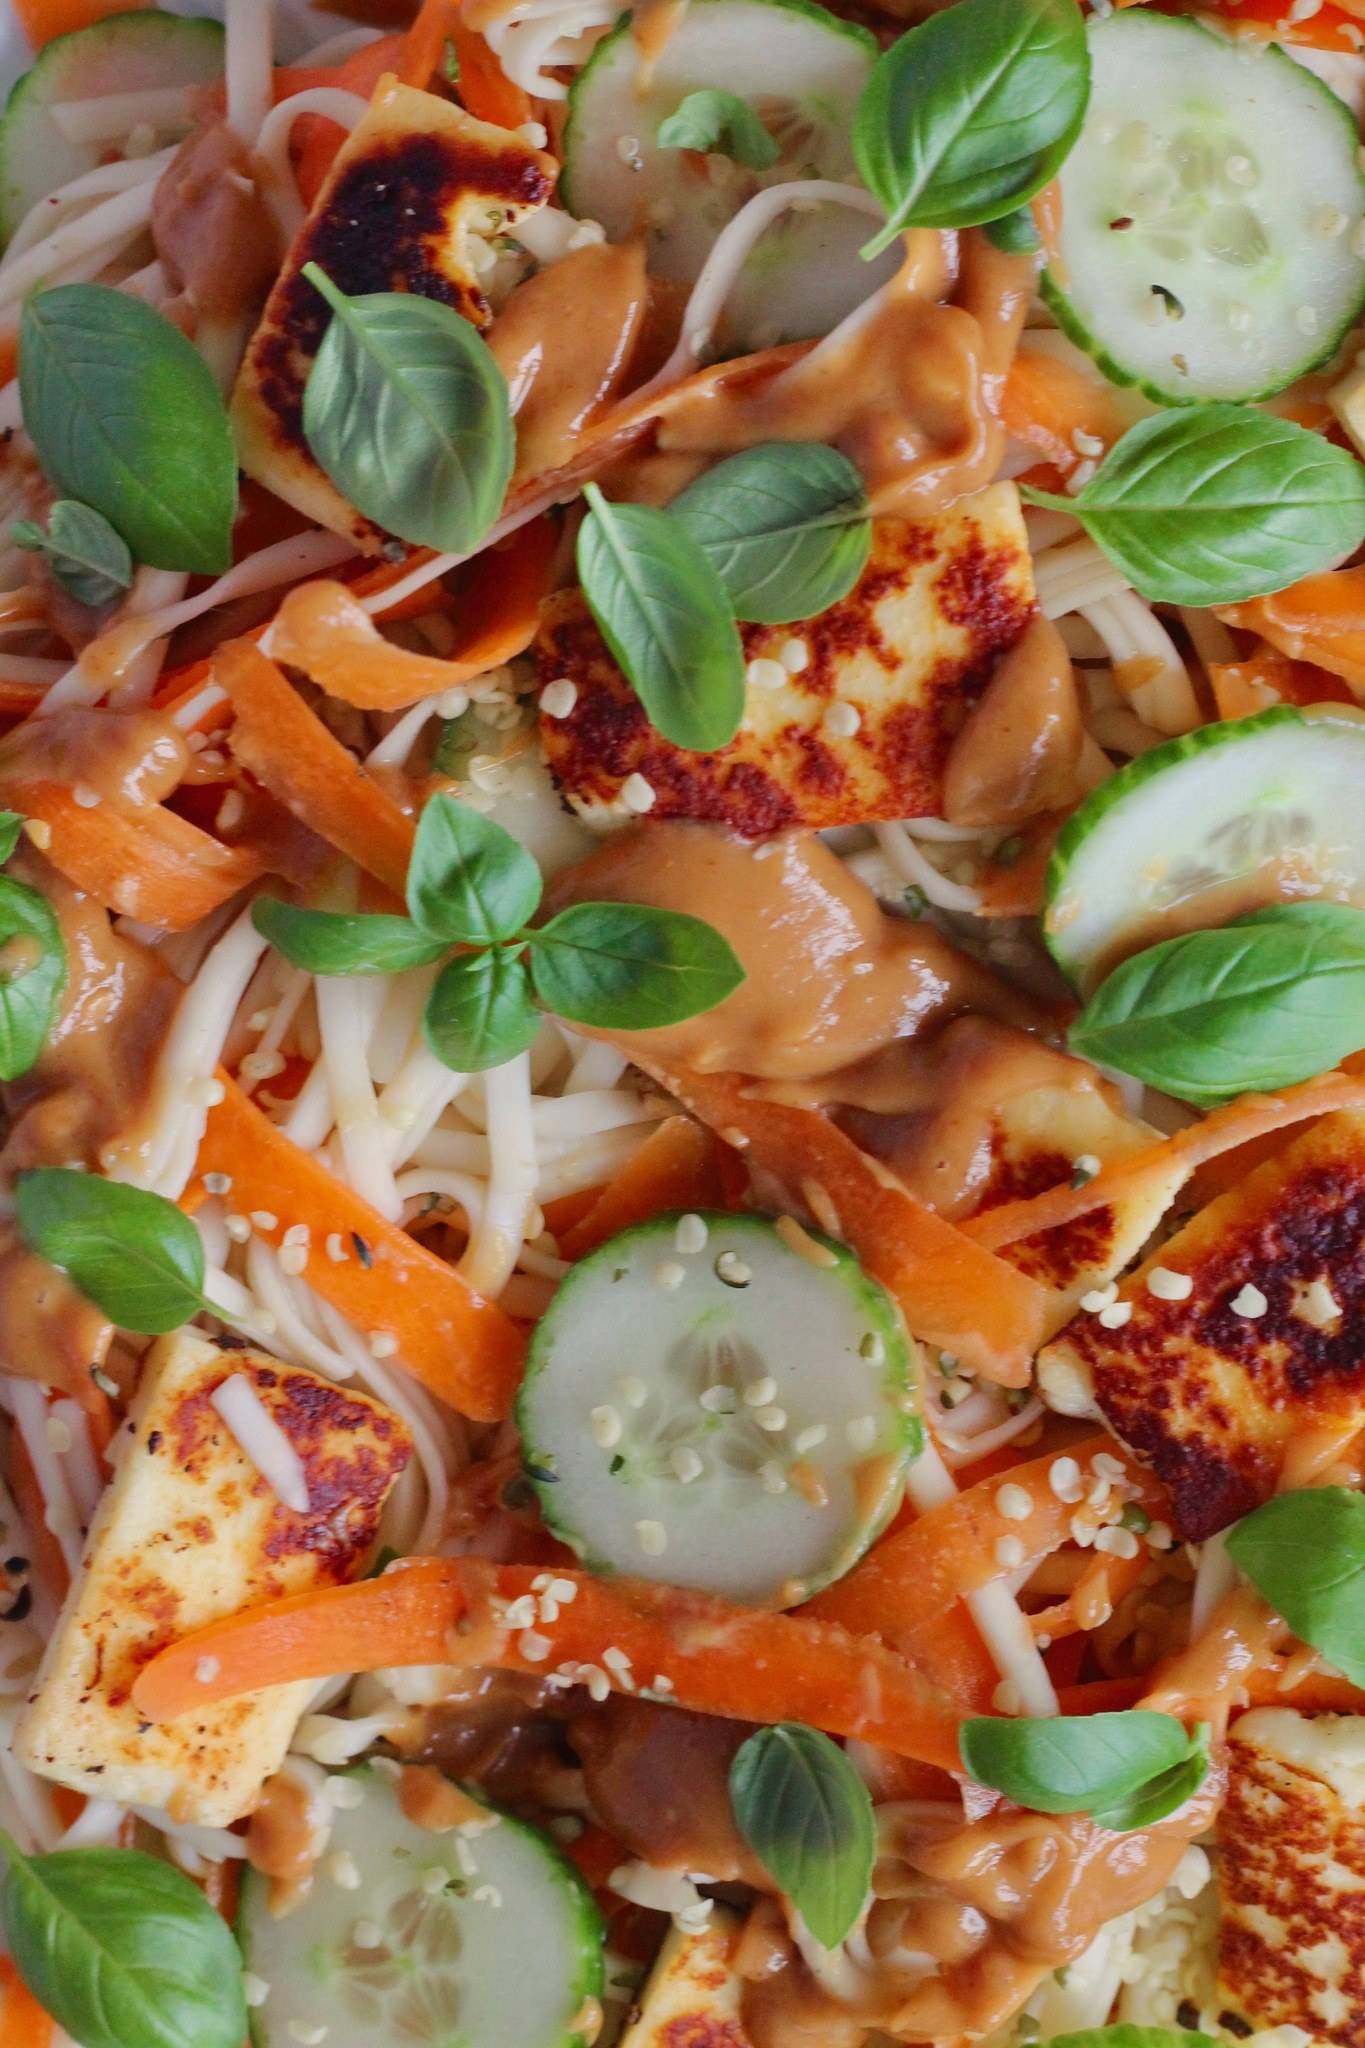 Kold nudelsalat med halloumi, grøntsager og peanutbutterdressing